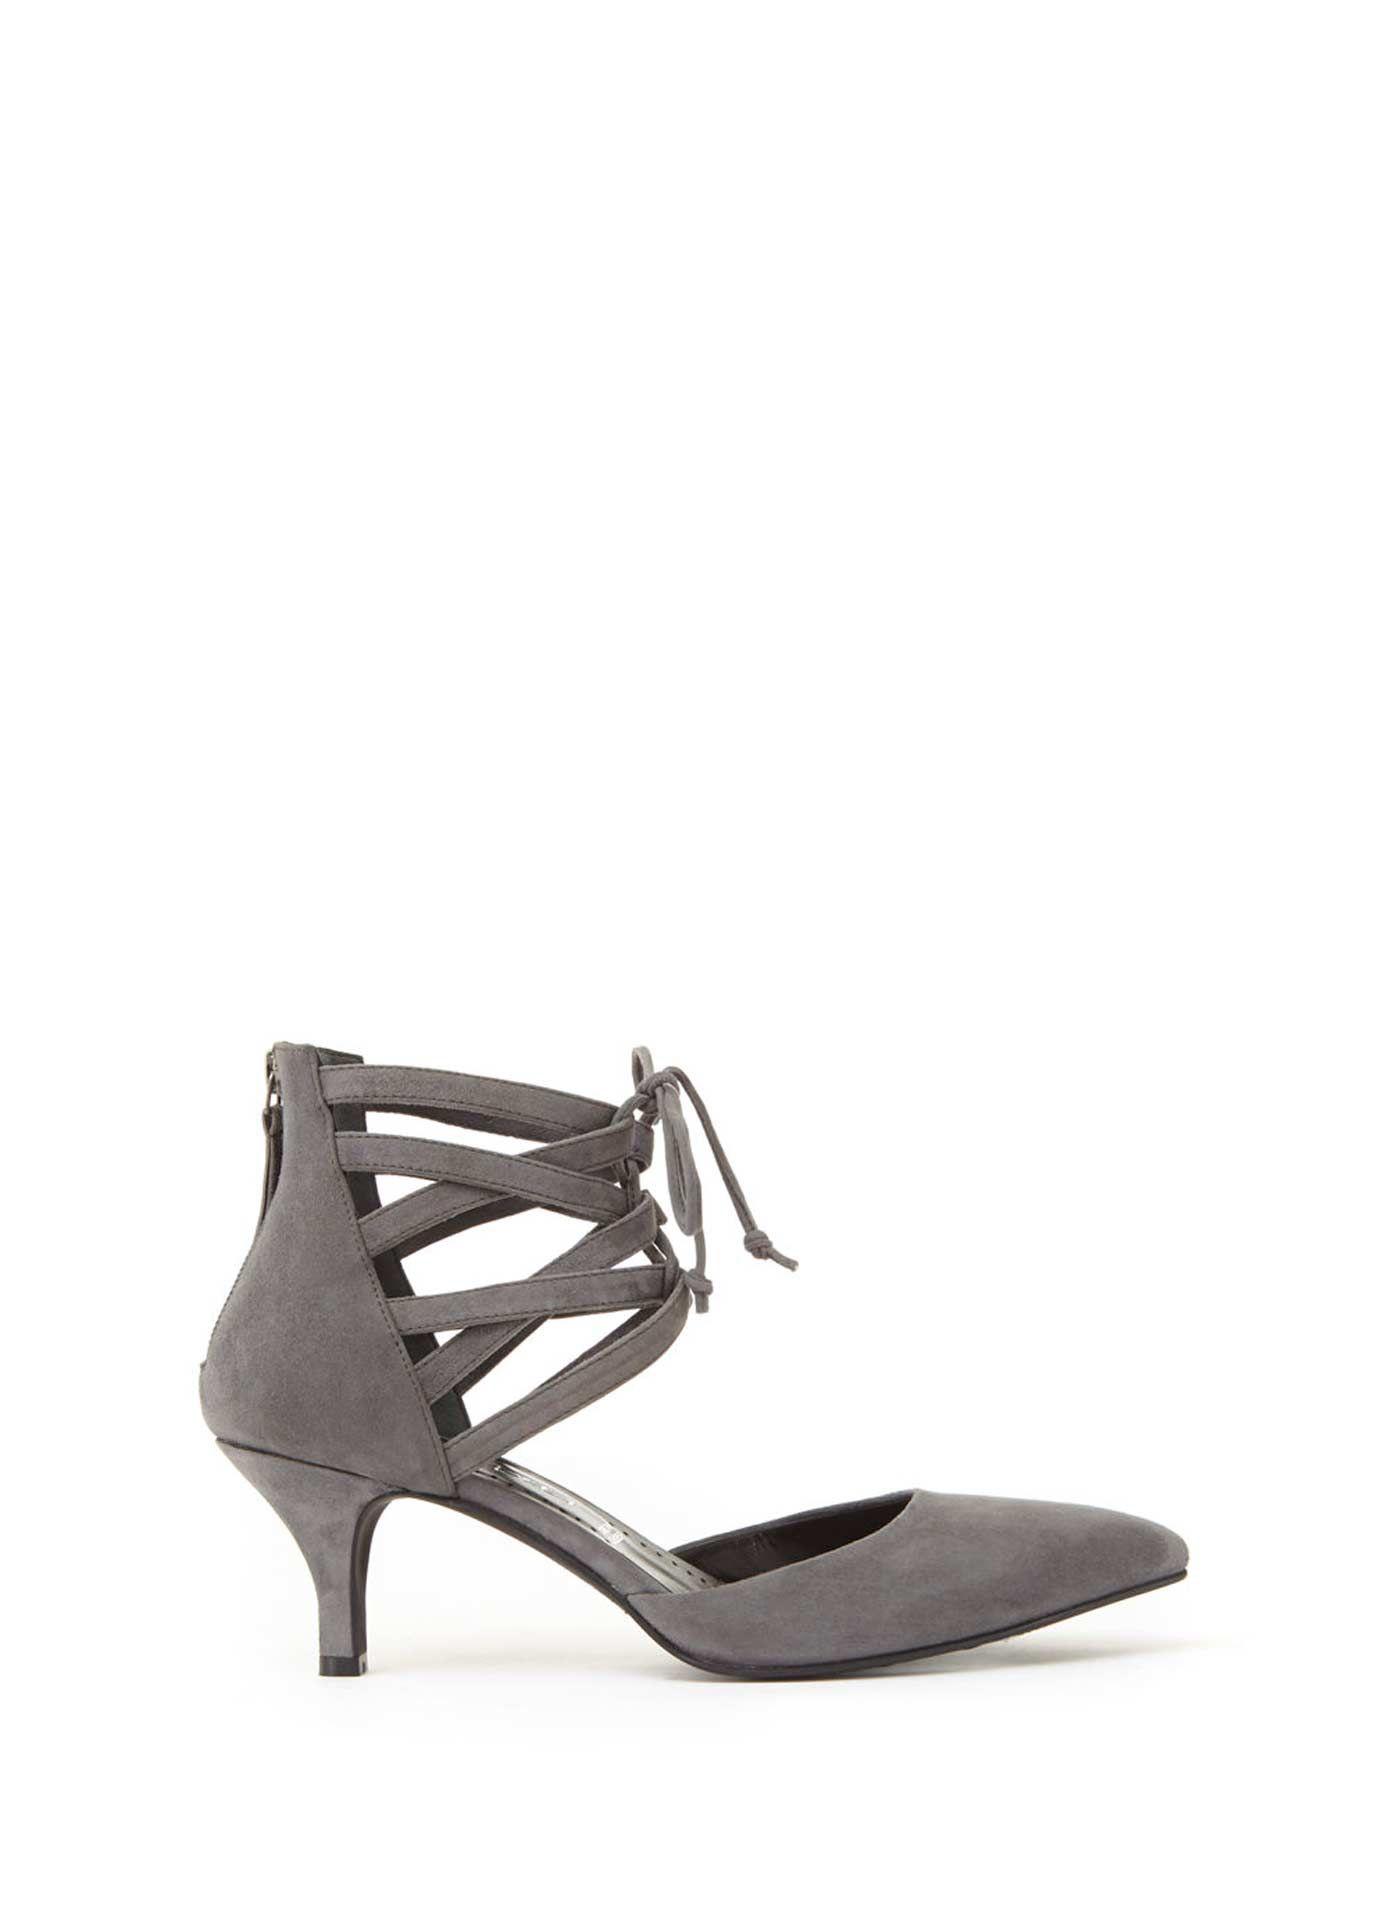 5f56767bafd Grey Olive Lace Up Kitten Heel